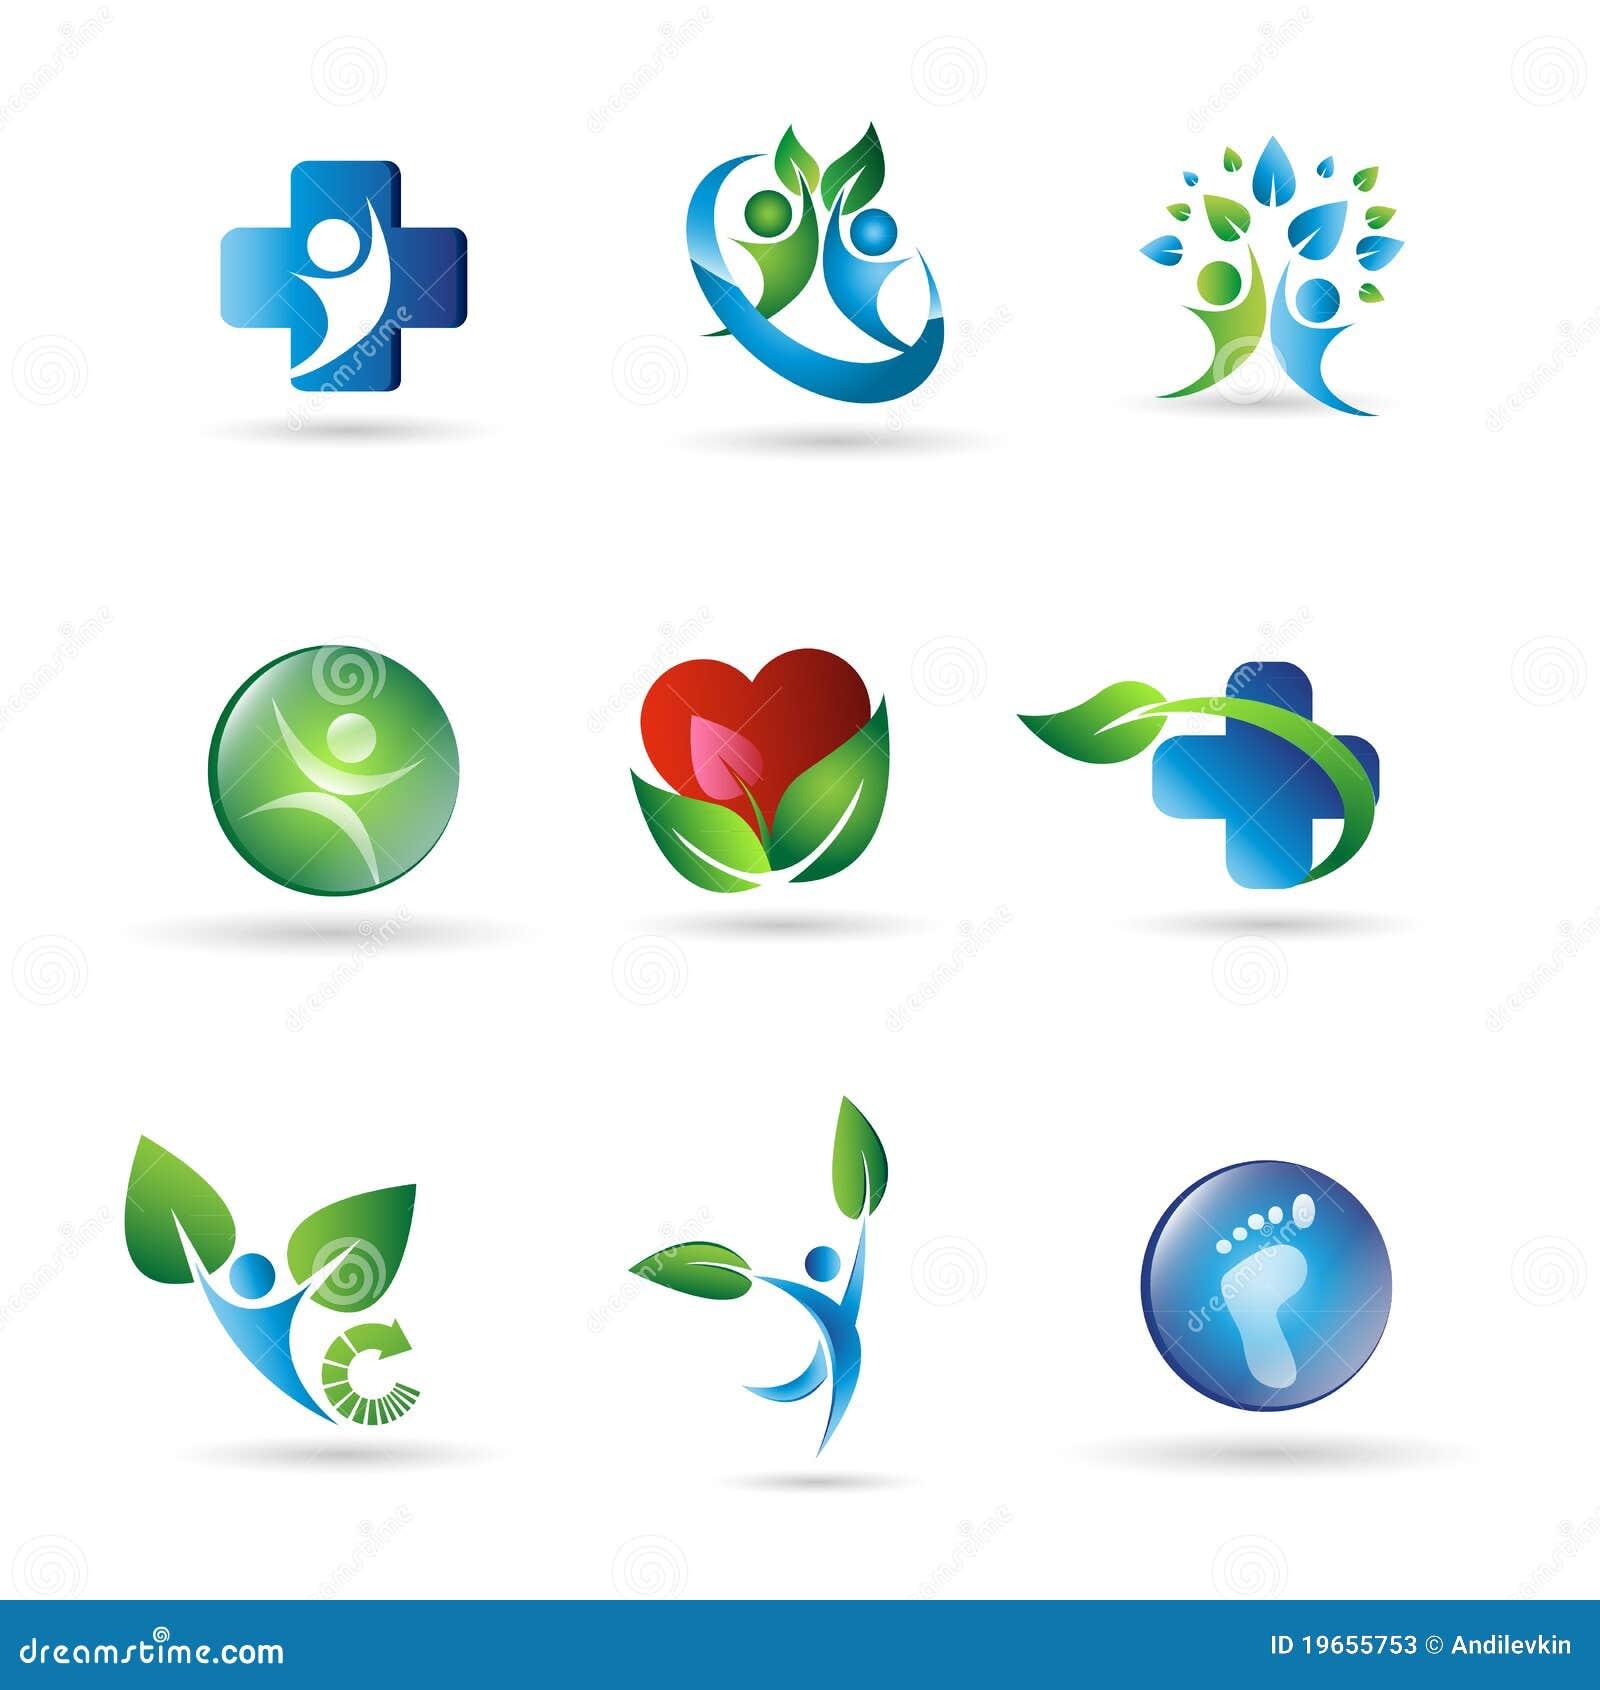 health-logos-19655753.jpg